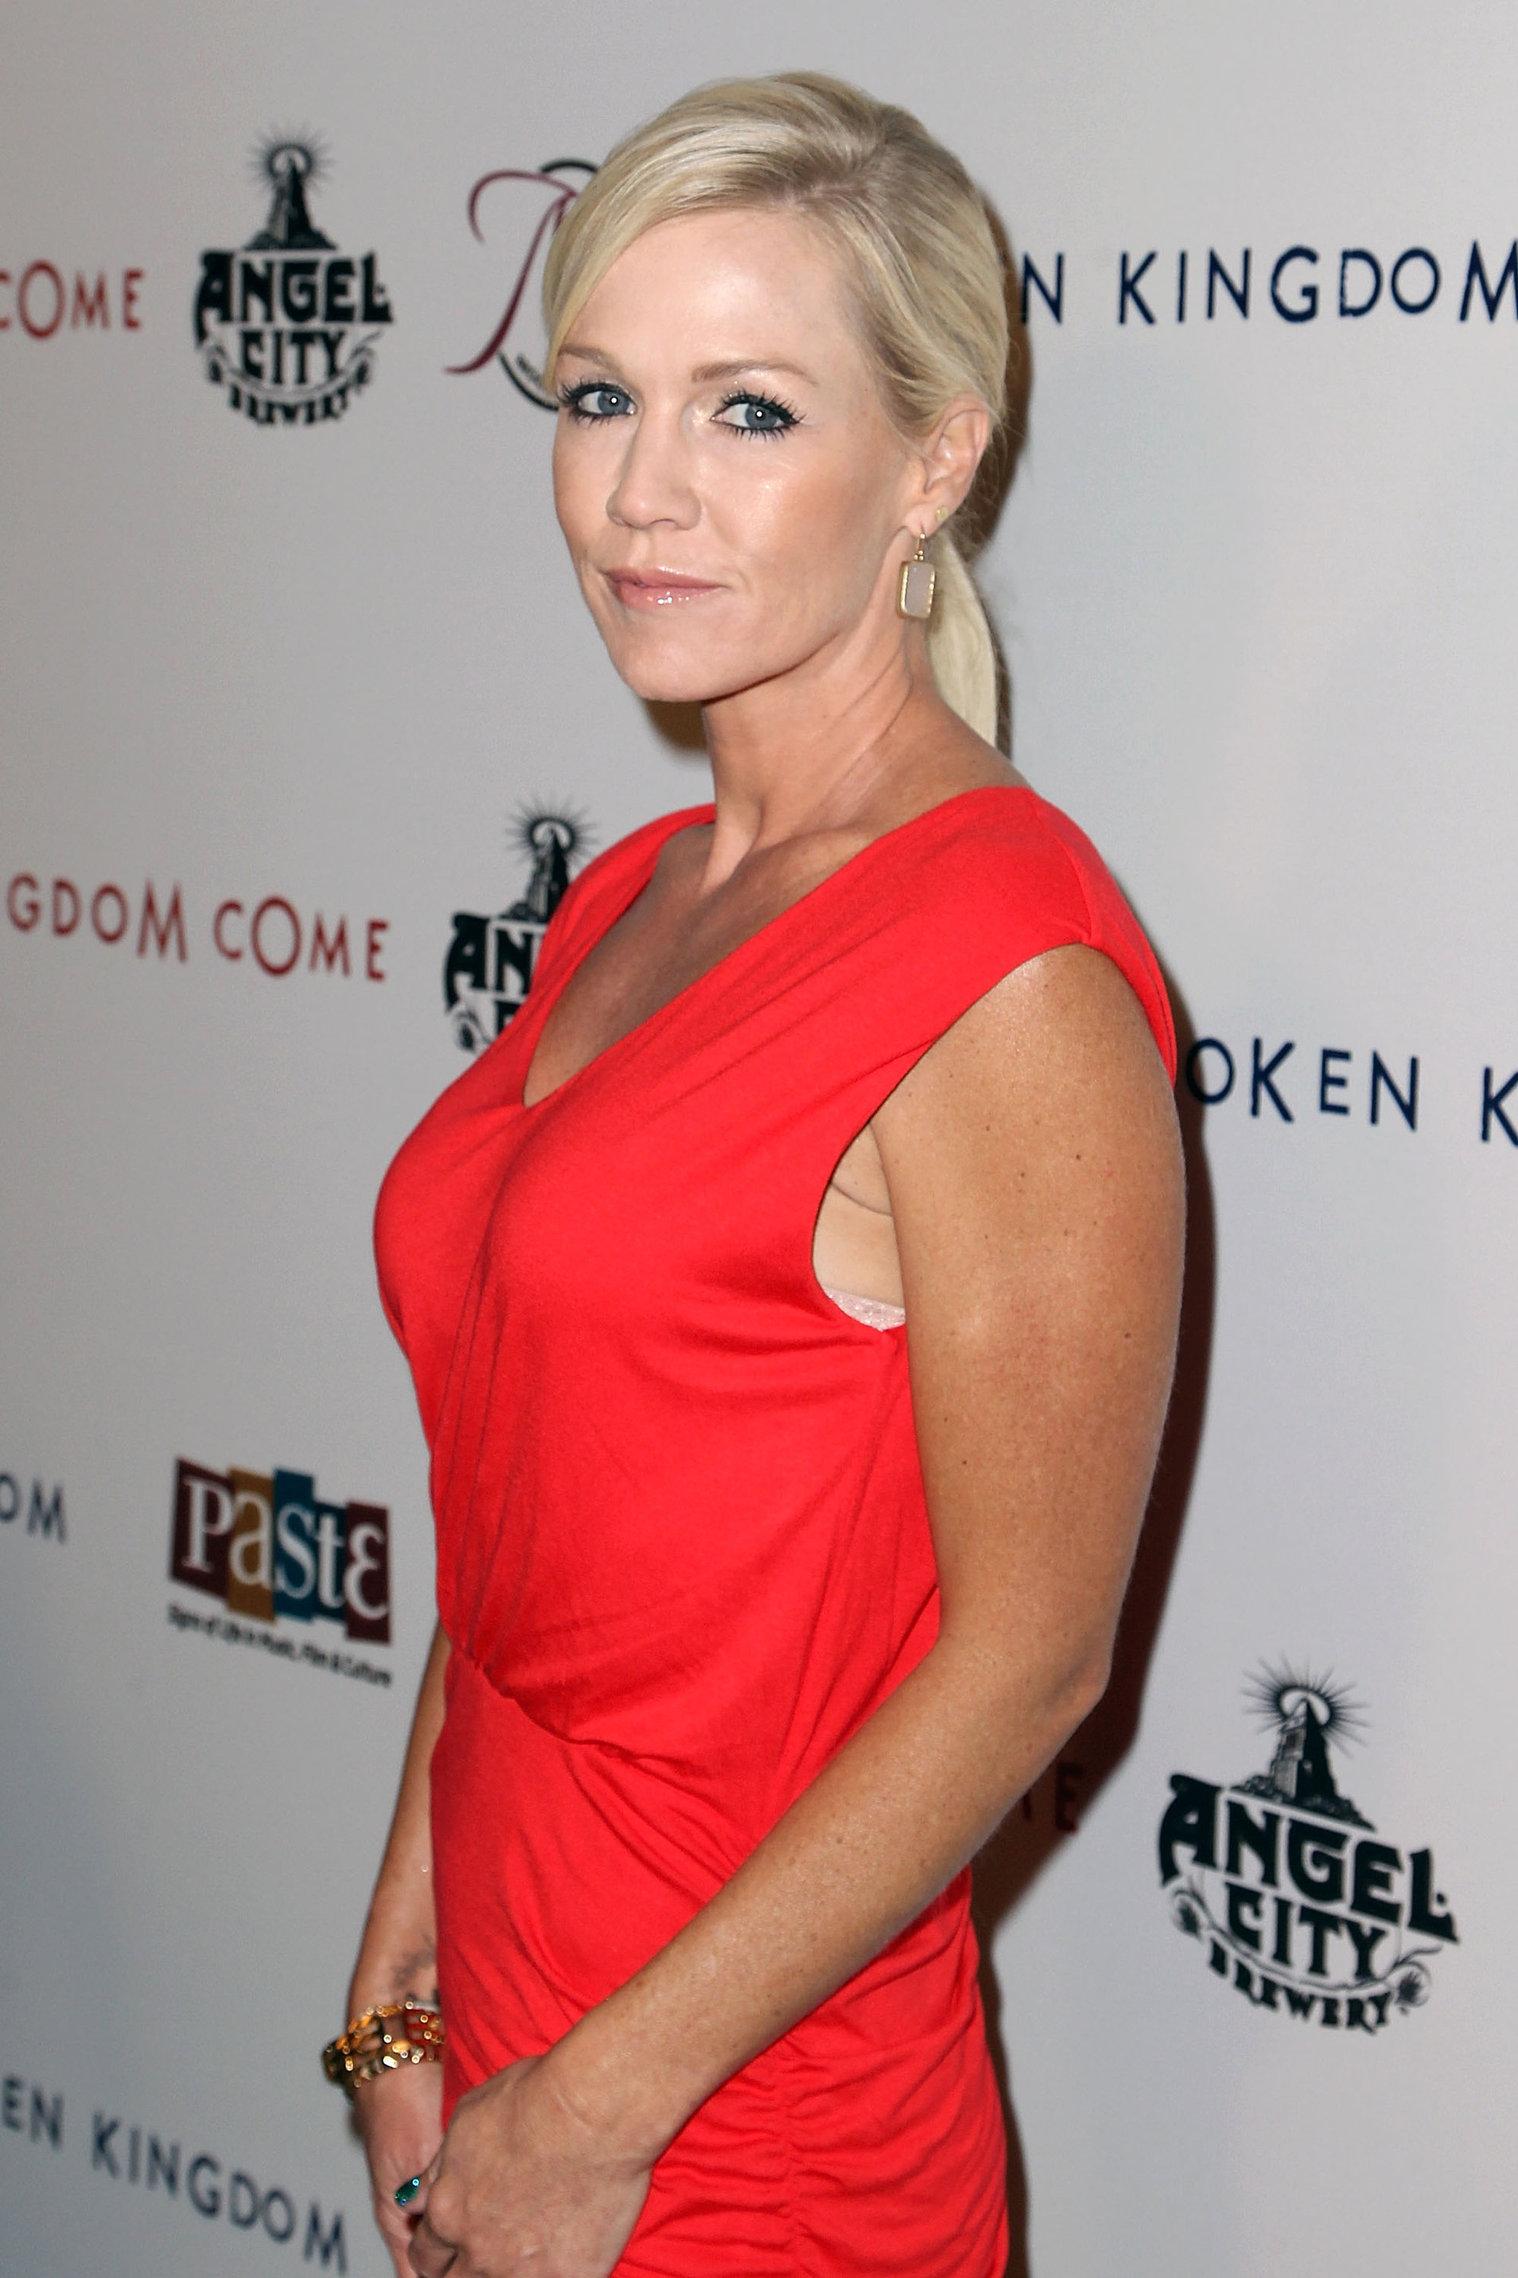 Jennie Garth  Kingdom Come  - Los Angeles Premiere (Oct 2, 2012)